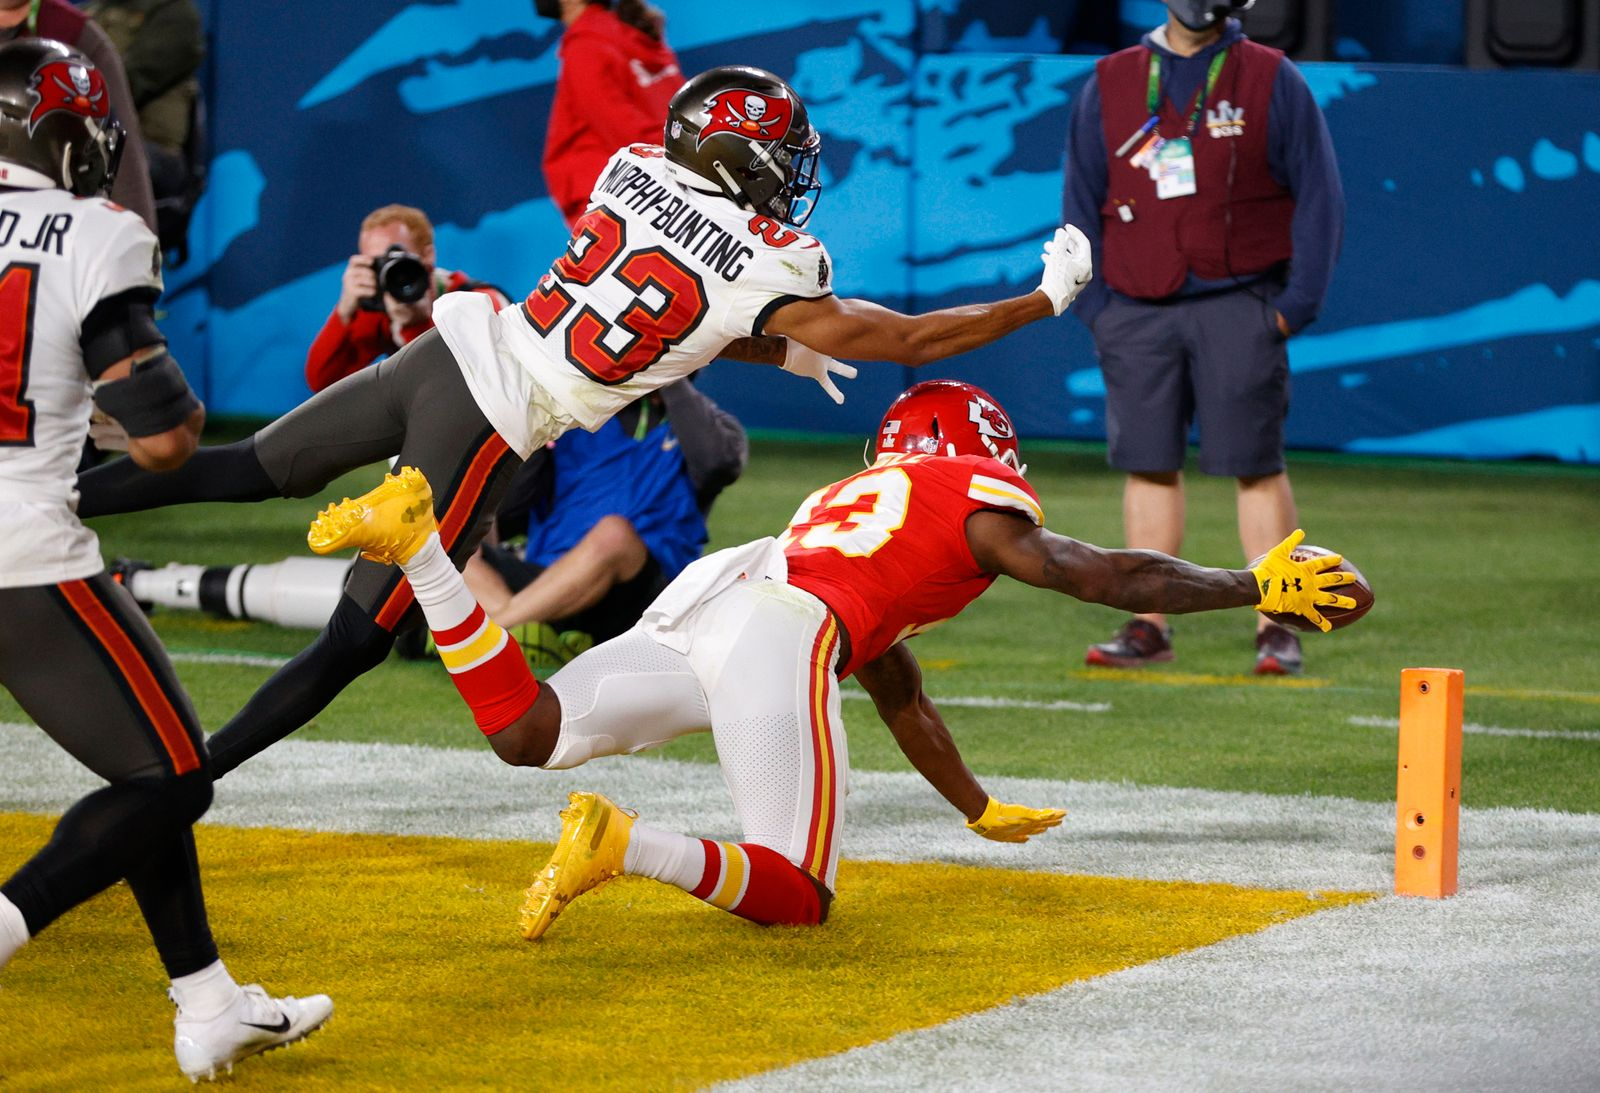 Super Bowl LV - Tampa Bay Buccaneers v Kansas City Chiefs